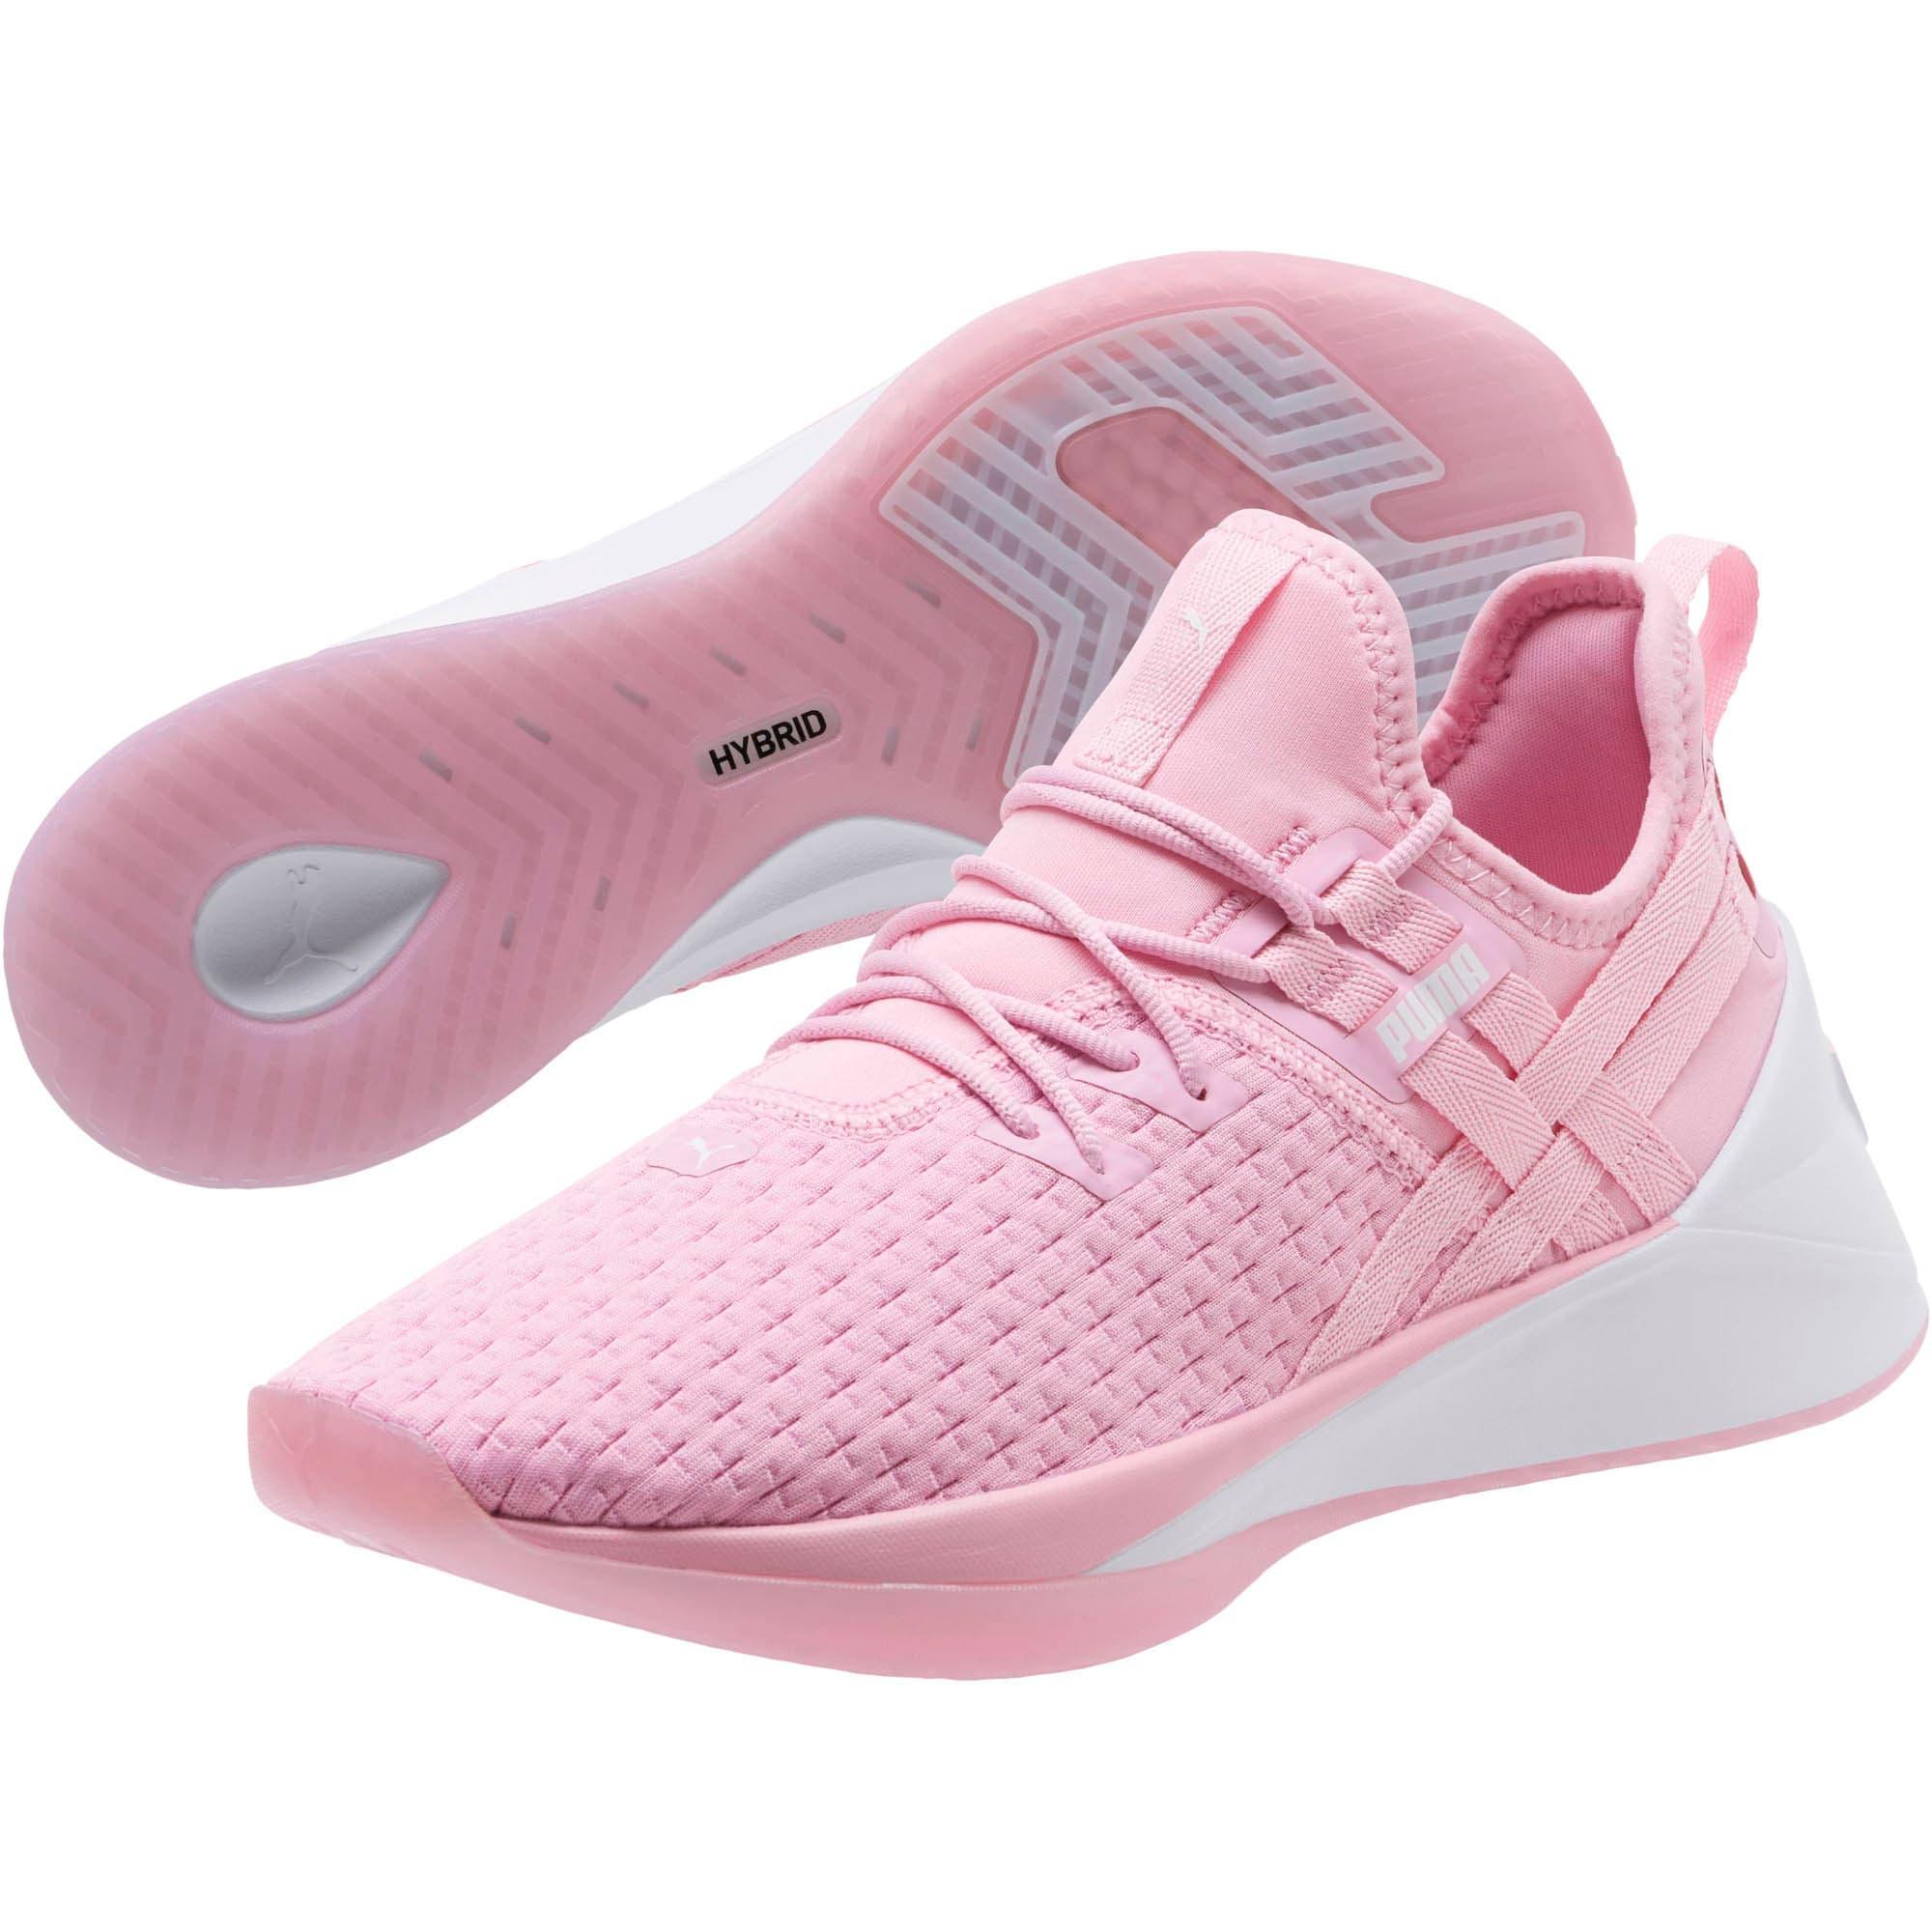 Thumbnail 2 of Jaab XT Women's Training Shoes, Lilac Sachet-Puma White, medium